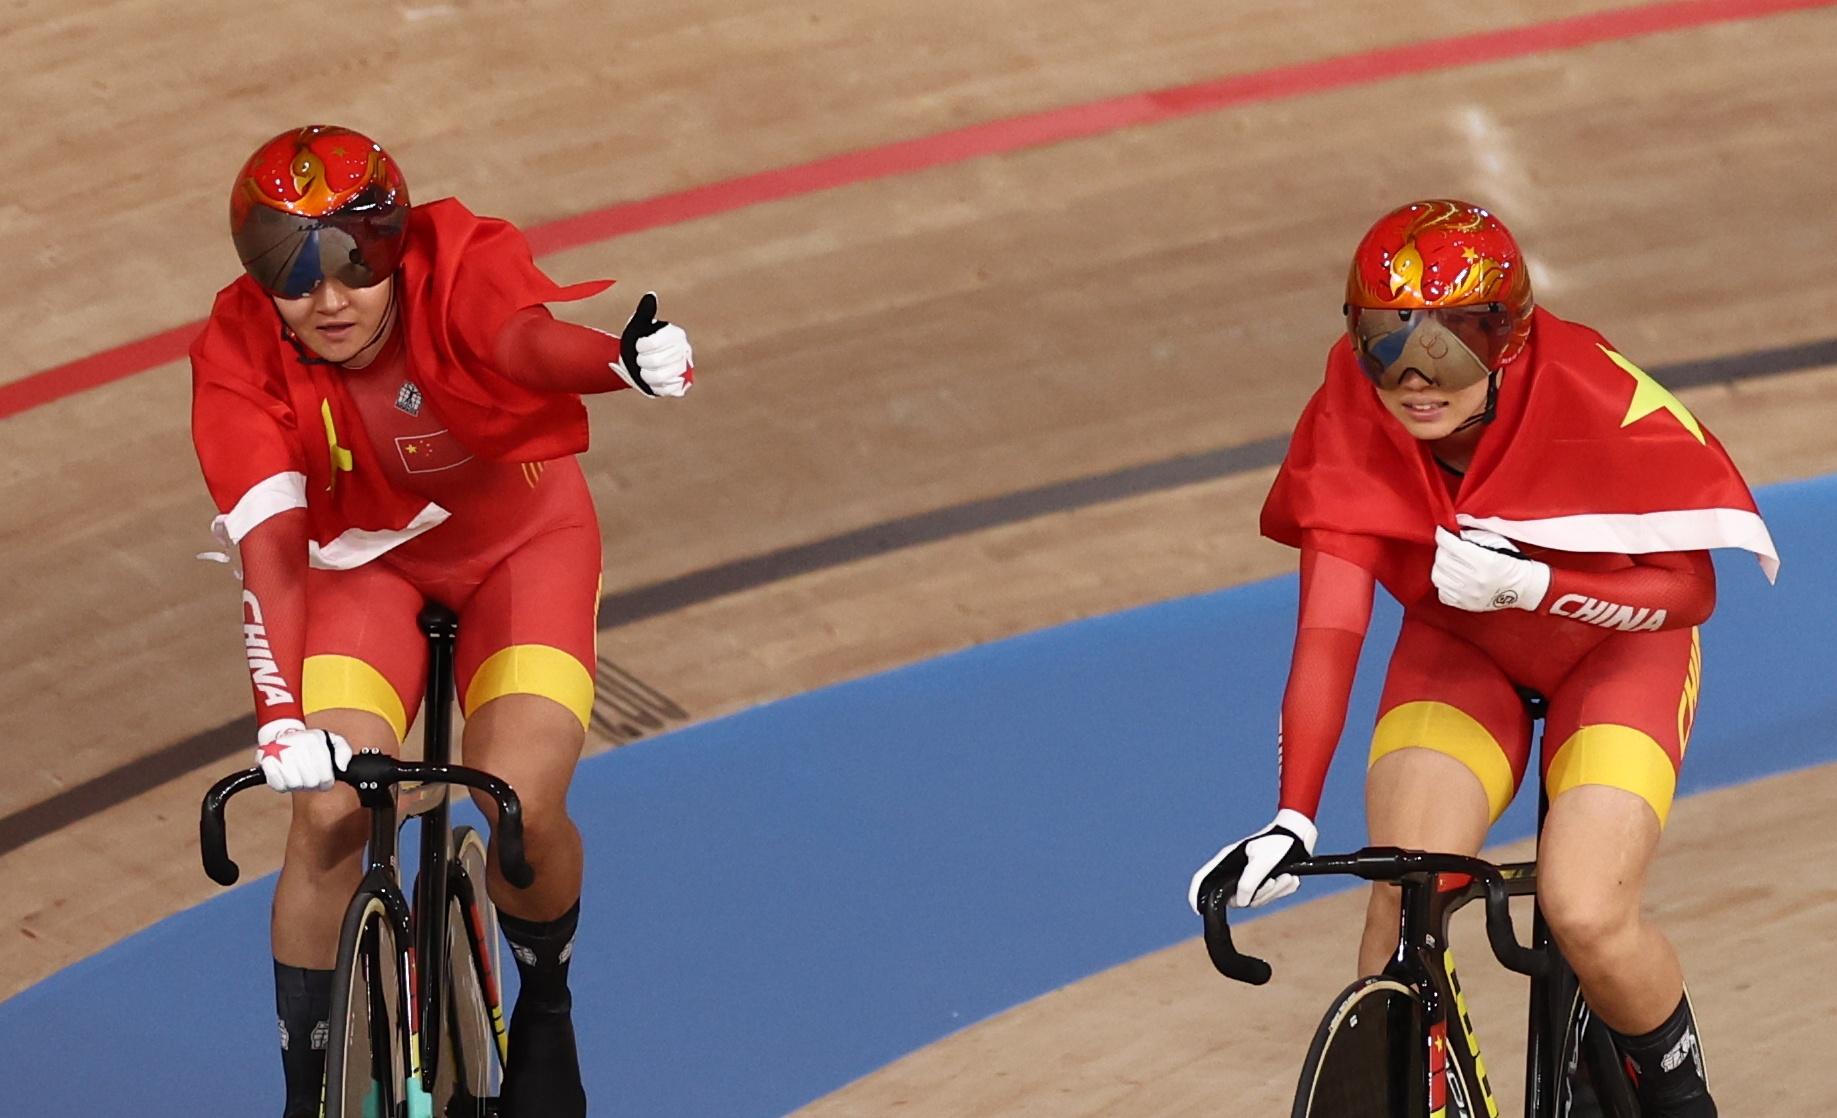 Tokyo 2020 Olympics - Cycling - Track - Women's Team Sprint - Gold Final - Izu Velodrome, Shizuoka, Japan - August 2, 2021. Bao Shanju of China and Zhong Tianshi of China celebrate winning the race and the gold medal REUTERS/Christian Hartmann